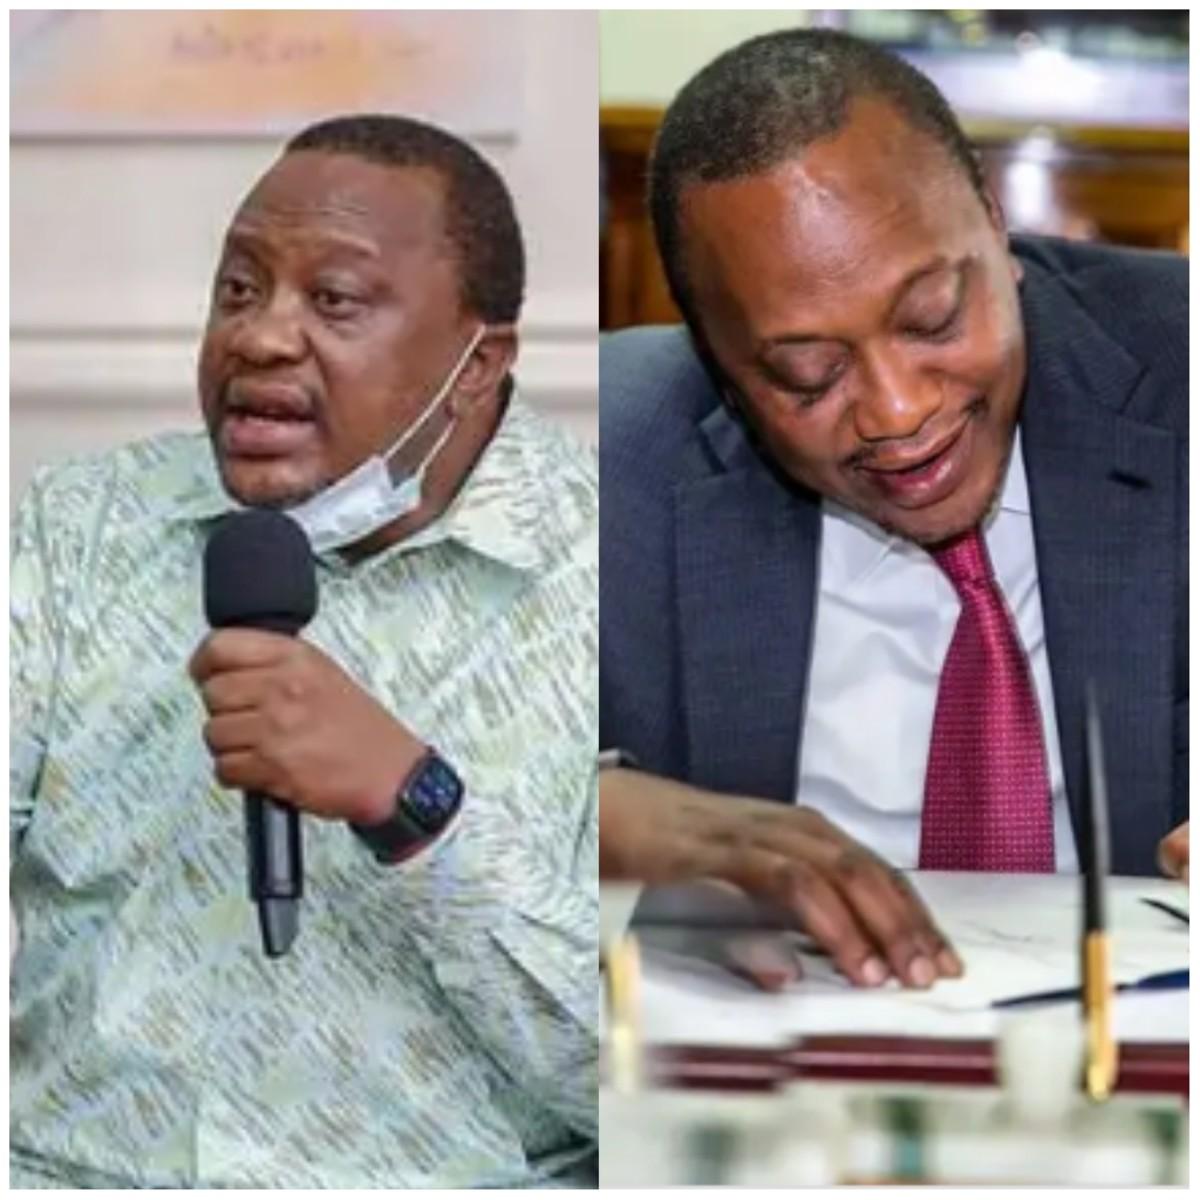 Uhuru Muigai Kenyatta: The Fourth President of Kenya